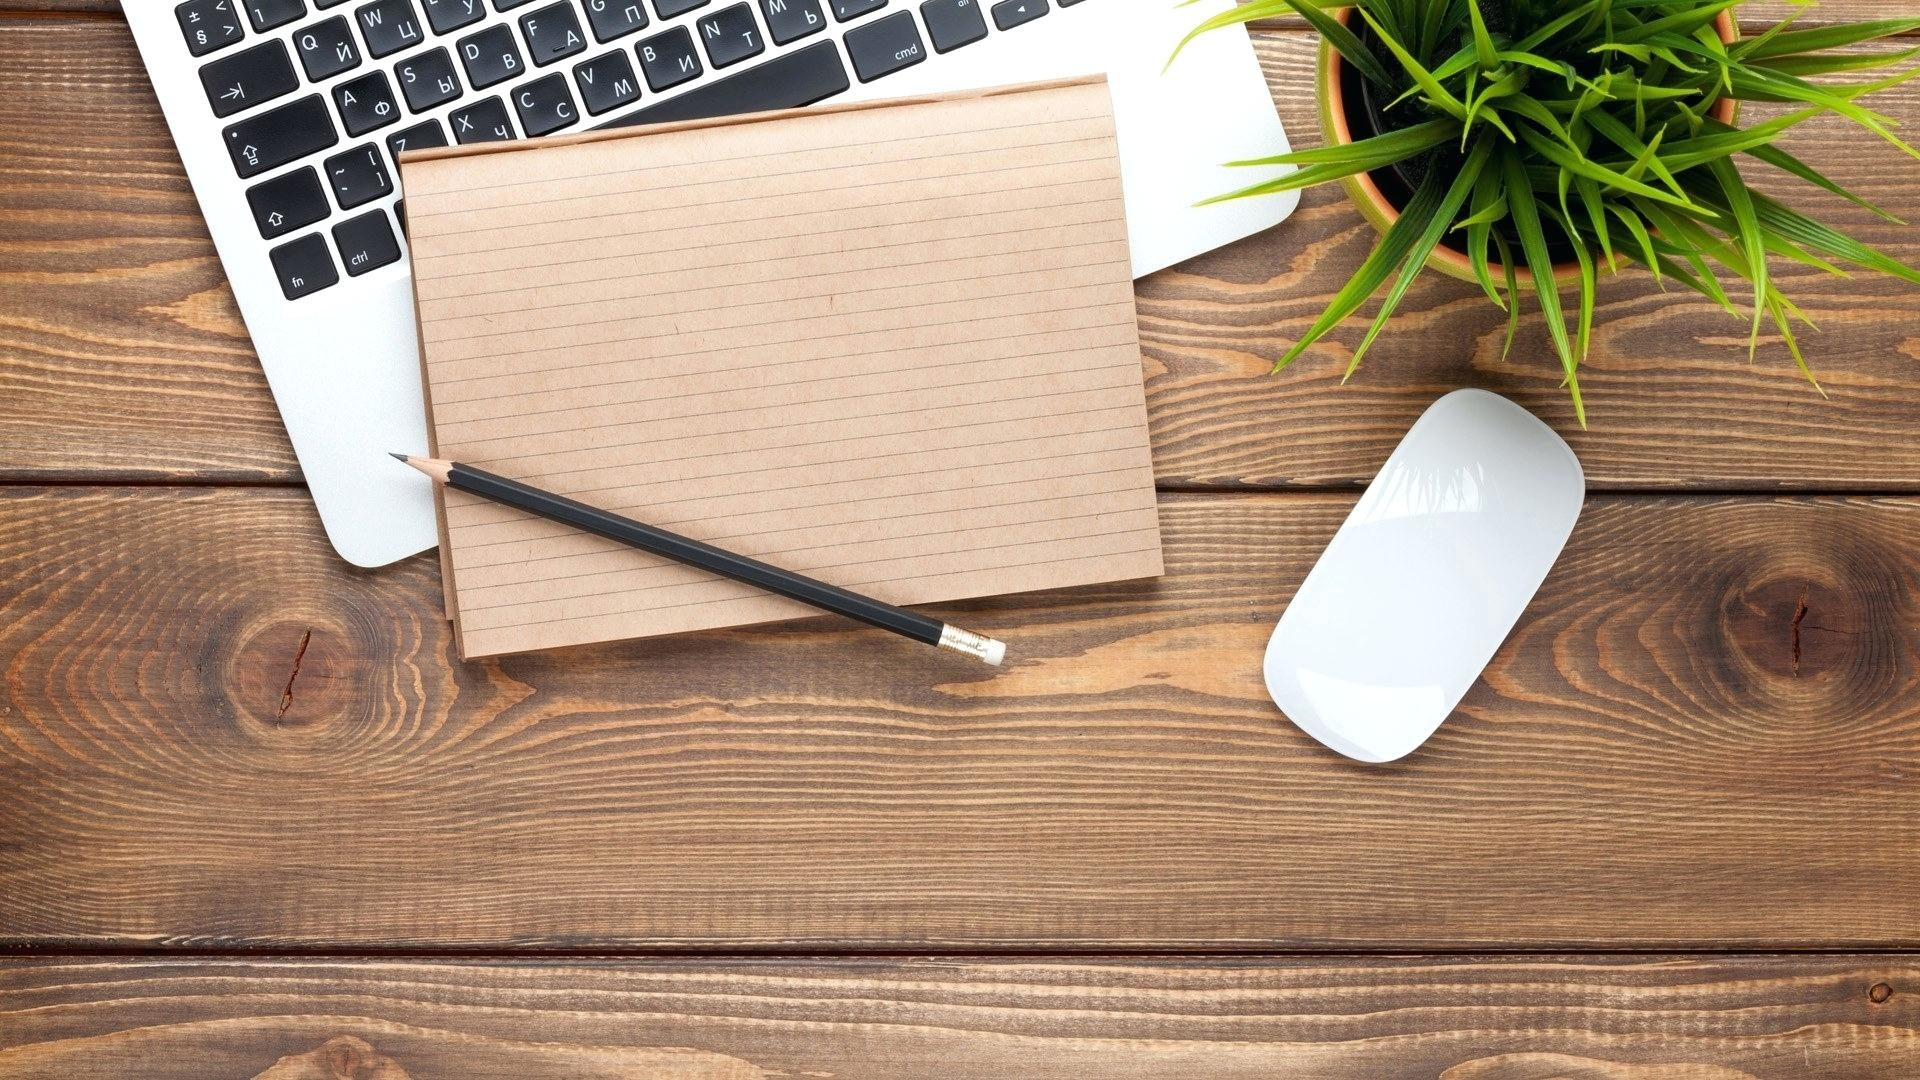 17 170718 office wallpapers hd home classic 3d desktop wallpaper